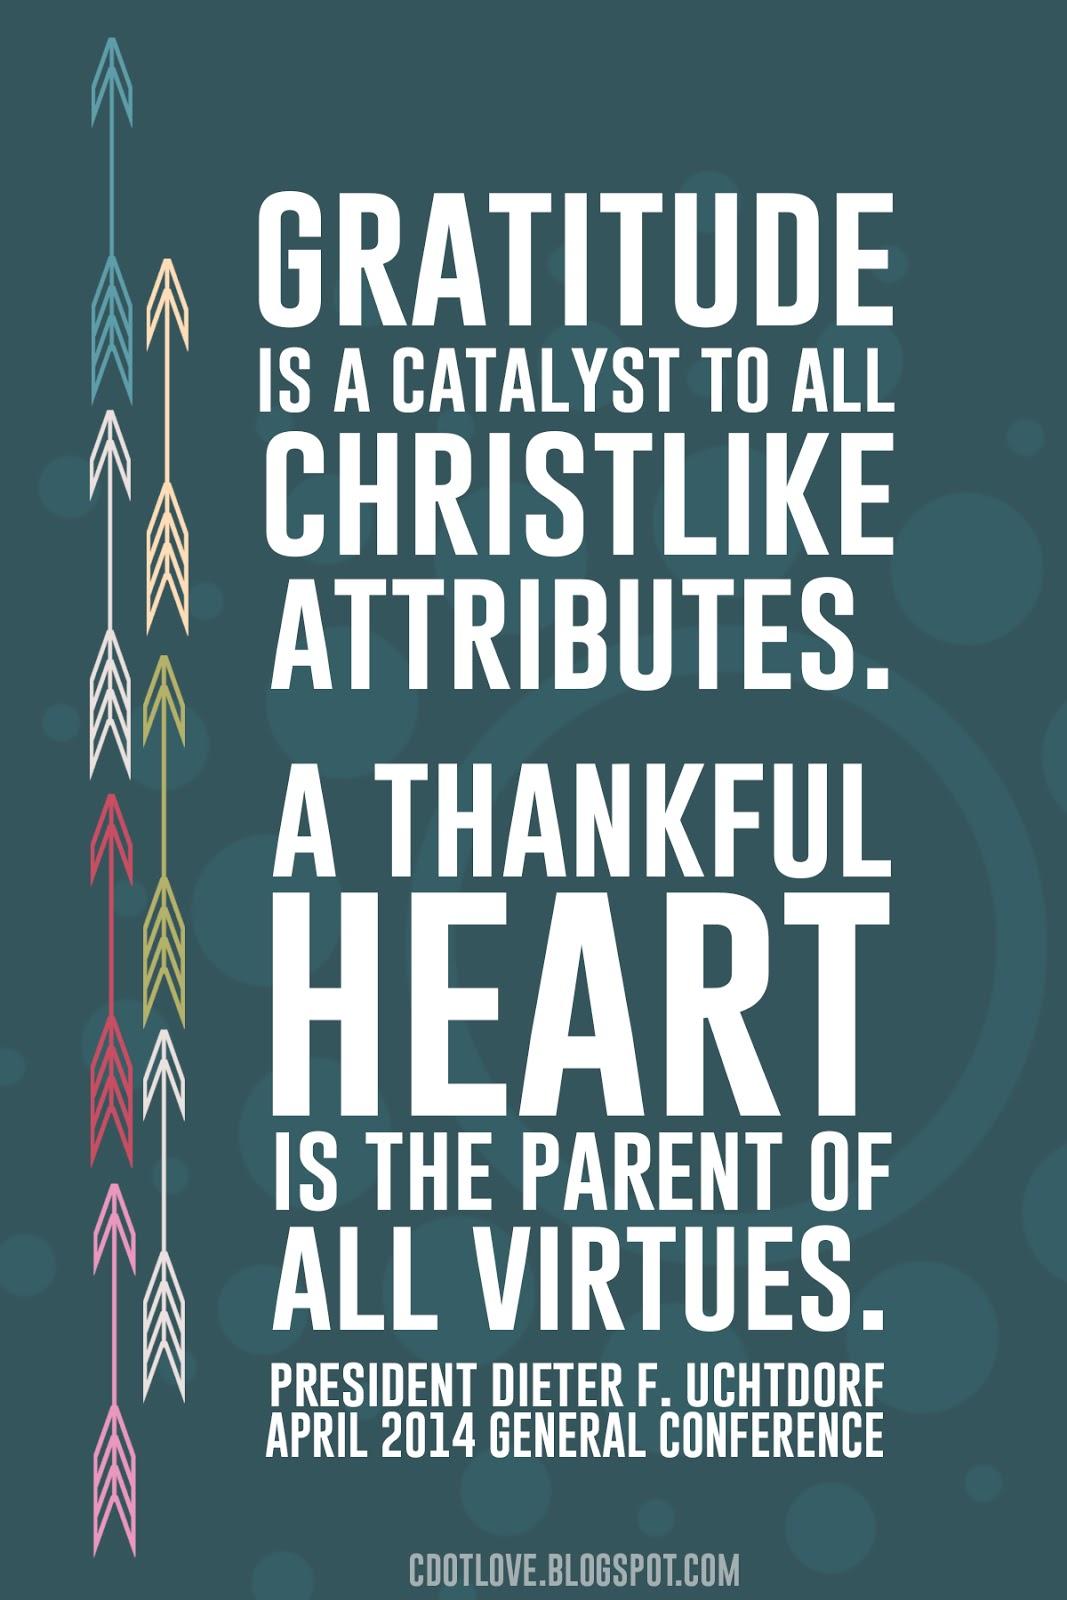 Talking Gratitude